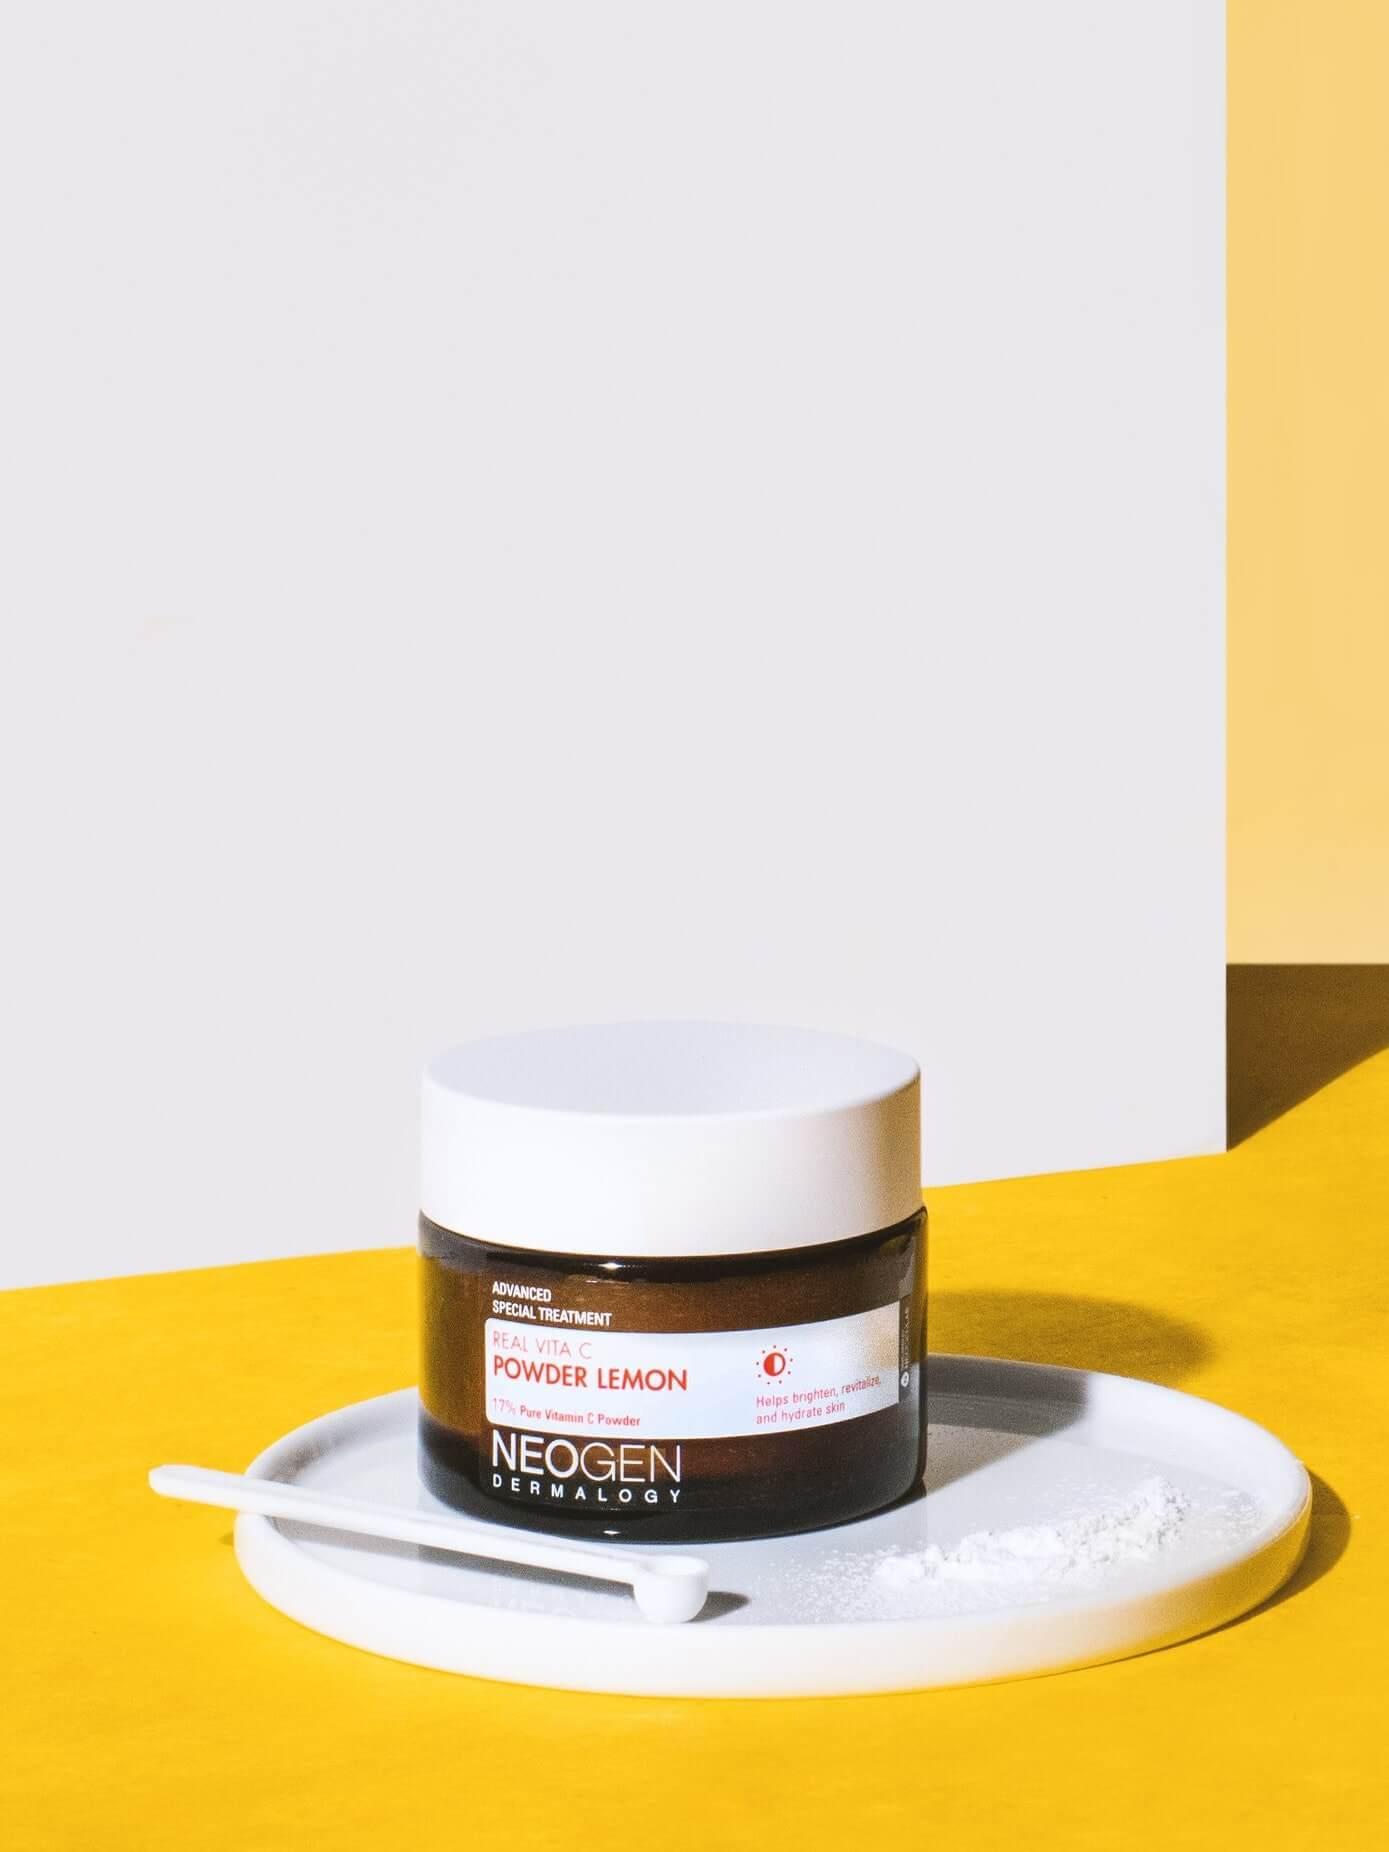 Neogen 一向以skincare產品為主,而這款是粉狀Vitamin C,優點是比一般液態的Vitamin C 更容易保存,而且不易變質。每次使用時只需少許的粉末,與護膚品混合,例如爽膚水等,皮膚就能吸新鮮的維他命。這產品適用於任何皮膚種類。